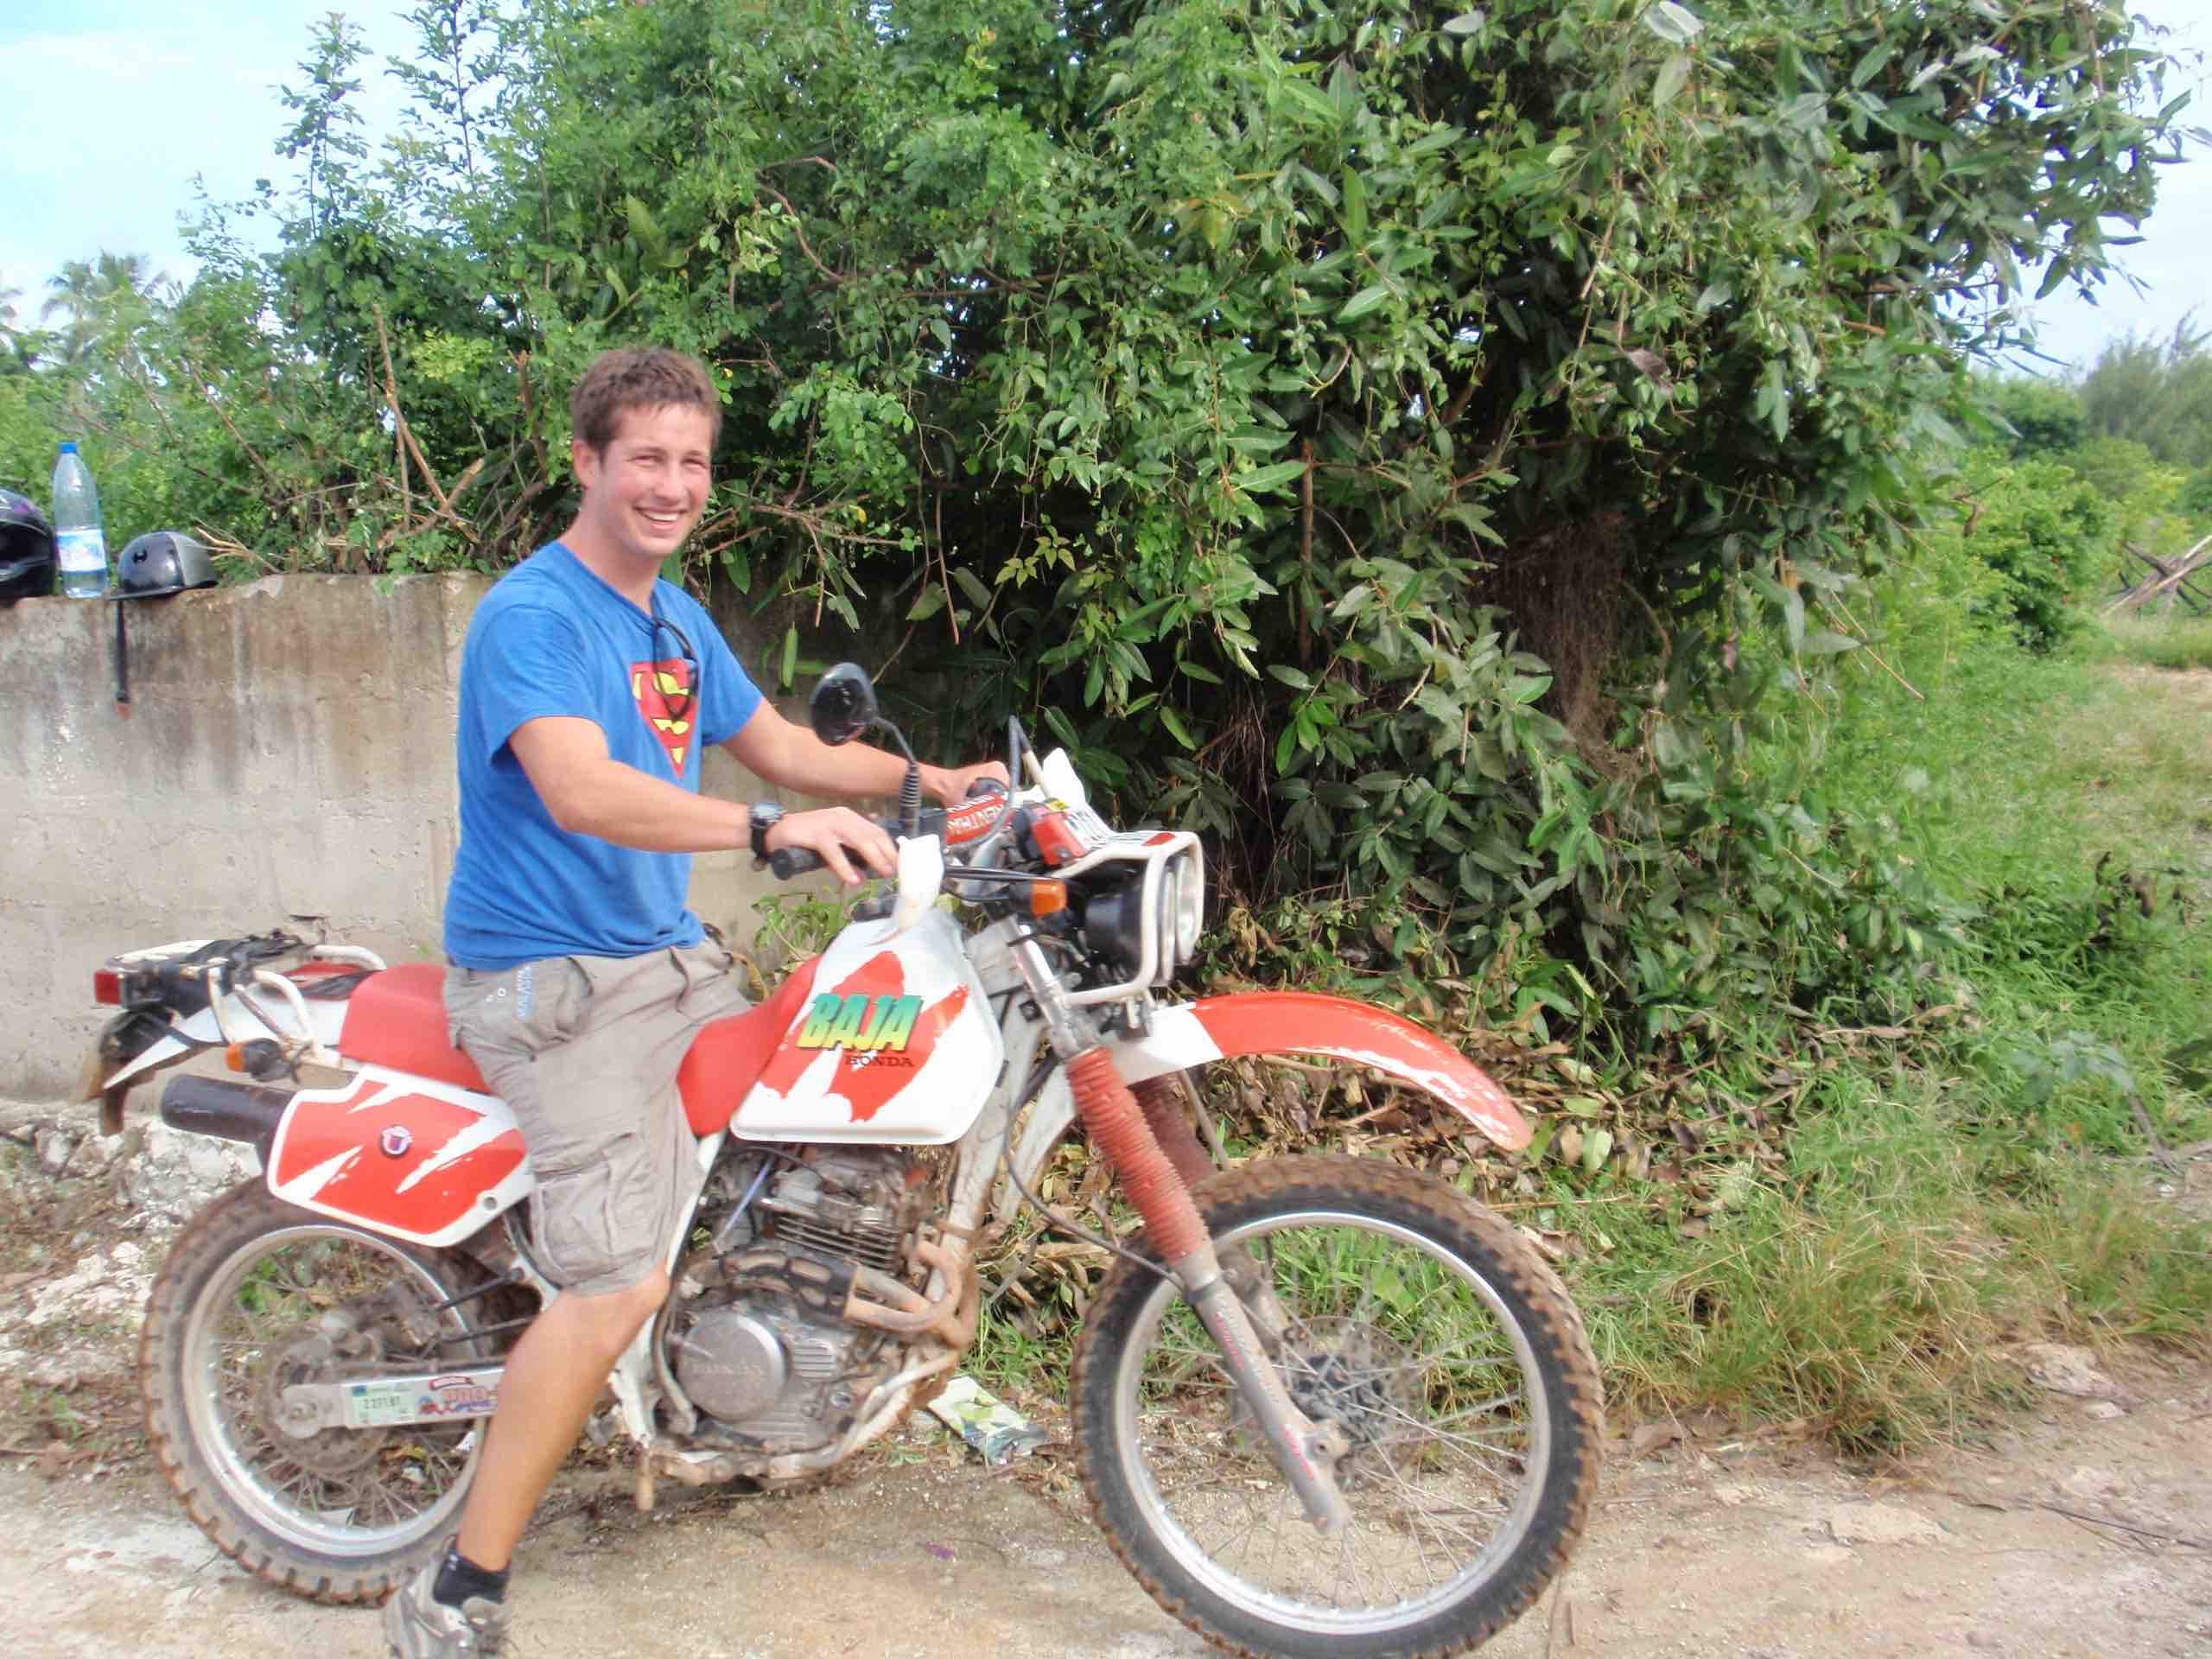 Bryan Clarke First Motorbike Ride Zanzibar 2